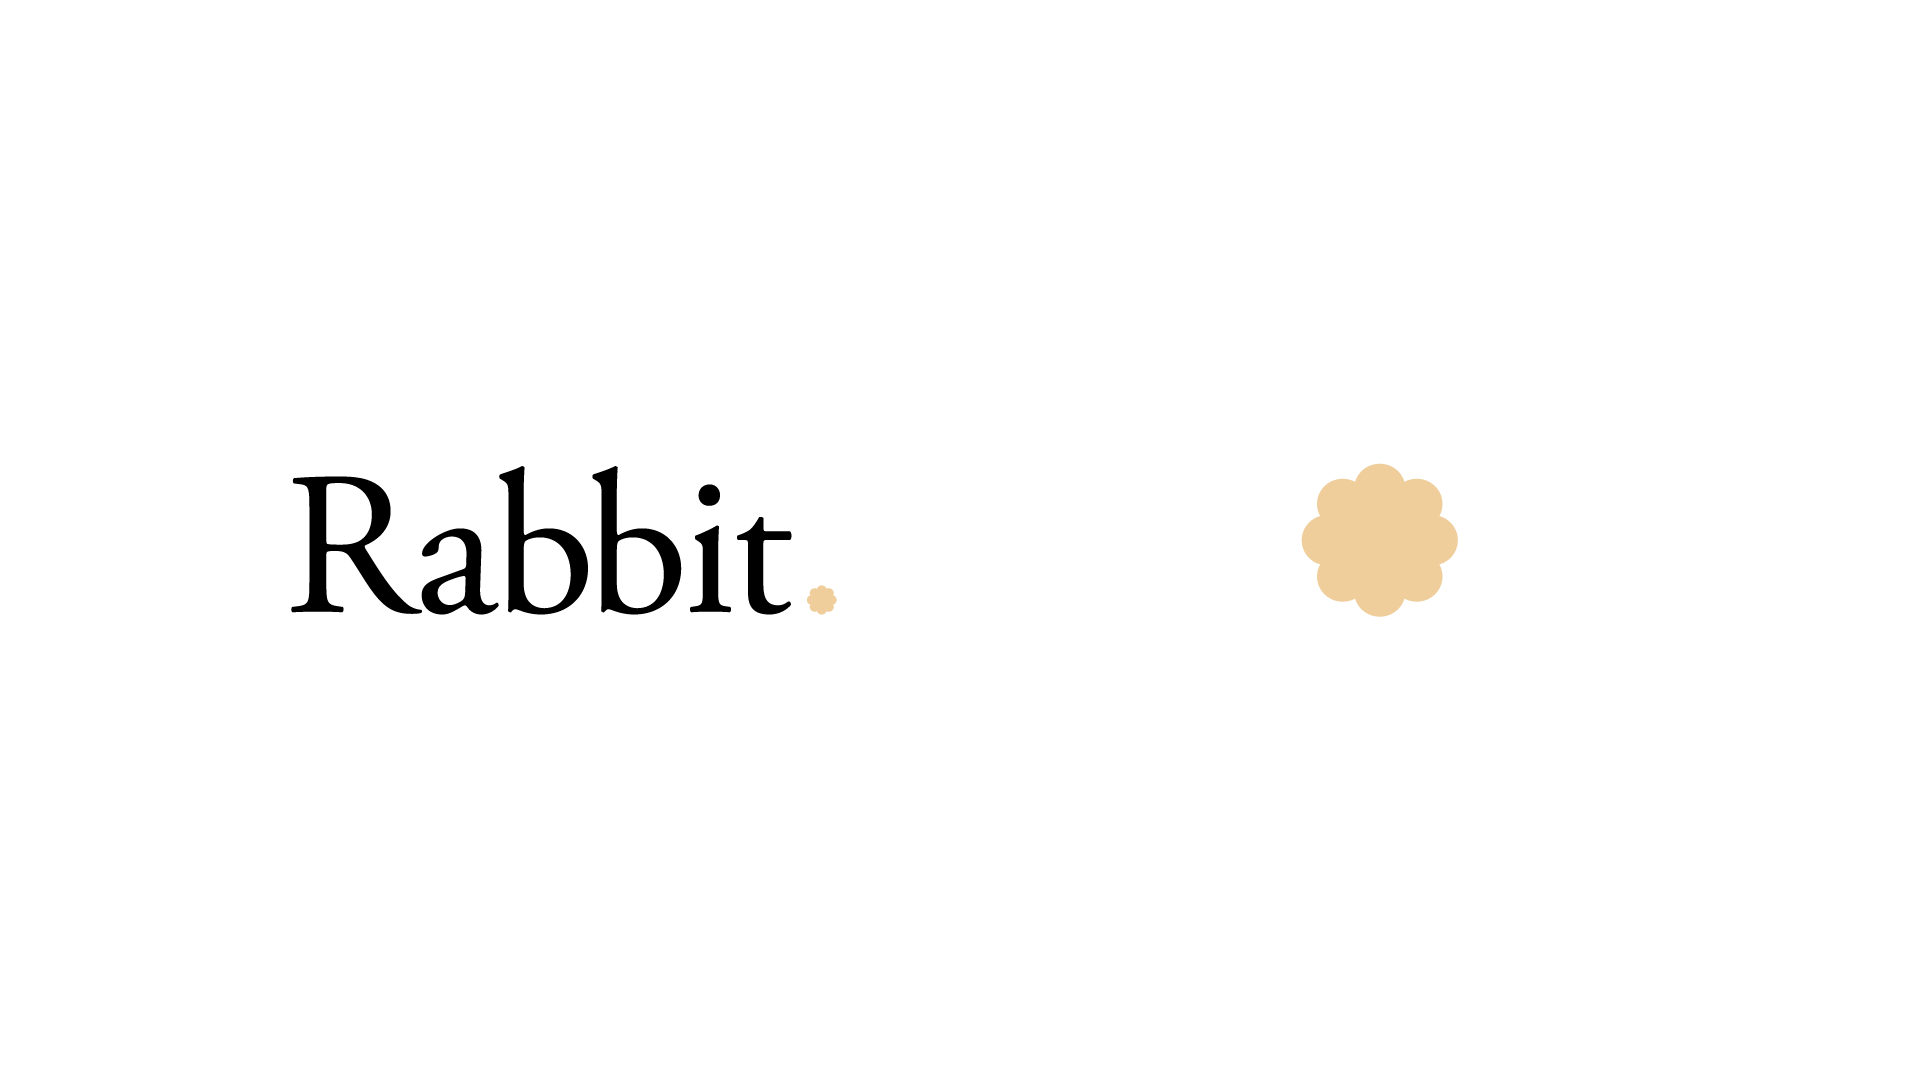 Rabbit Branding_Artboard 1V copy 3.png